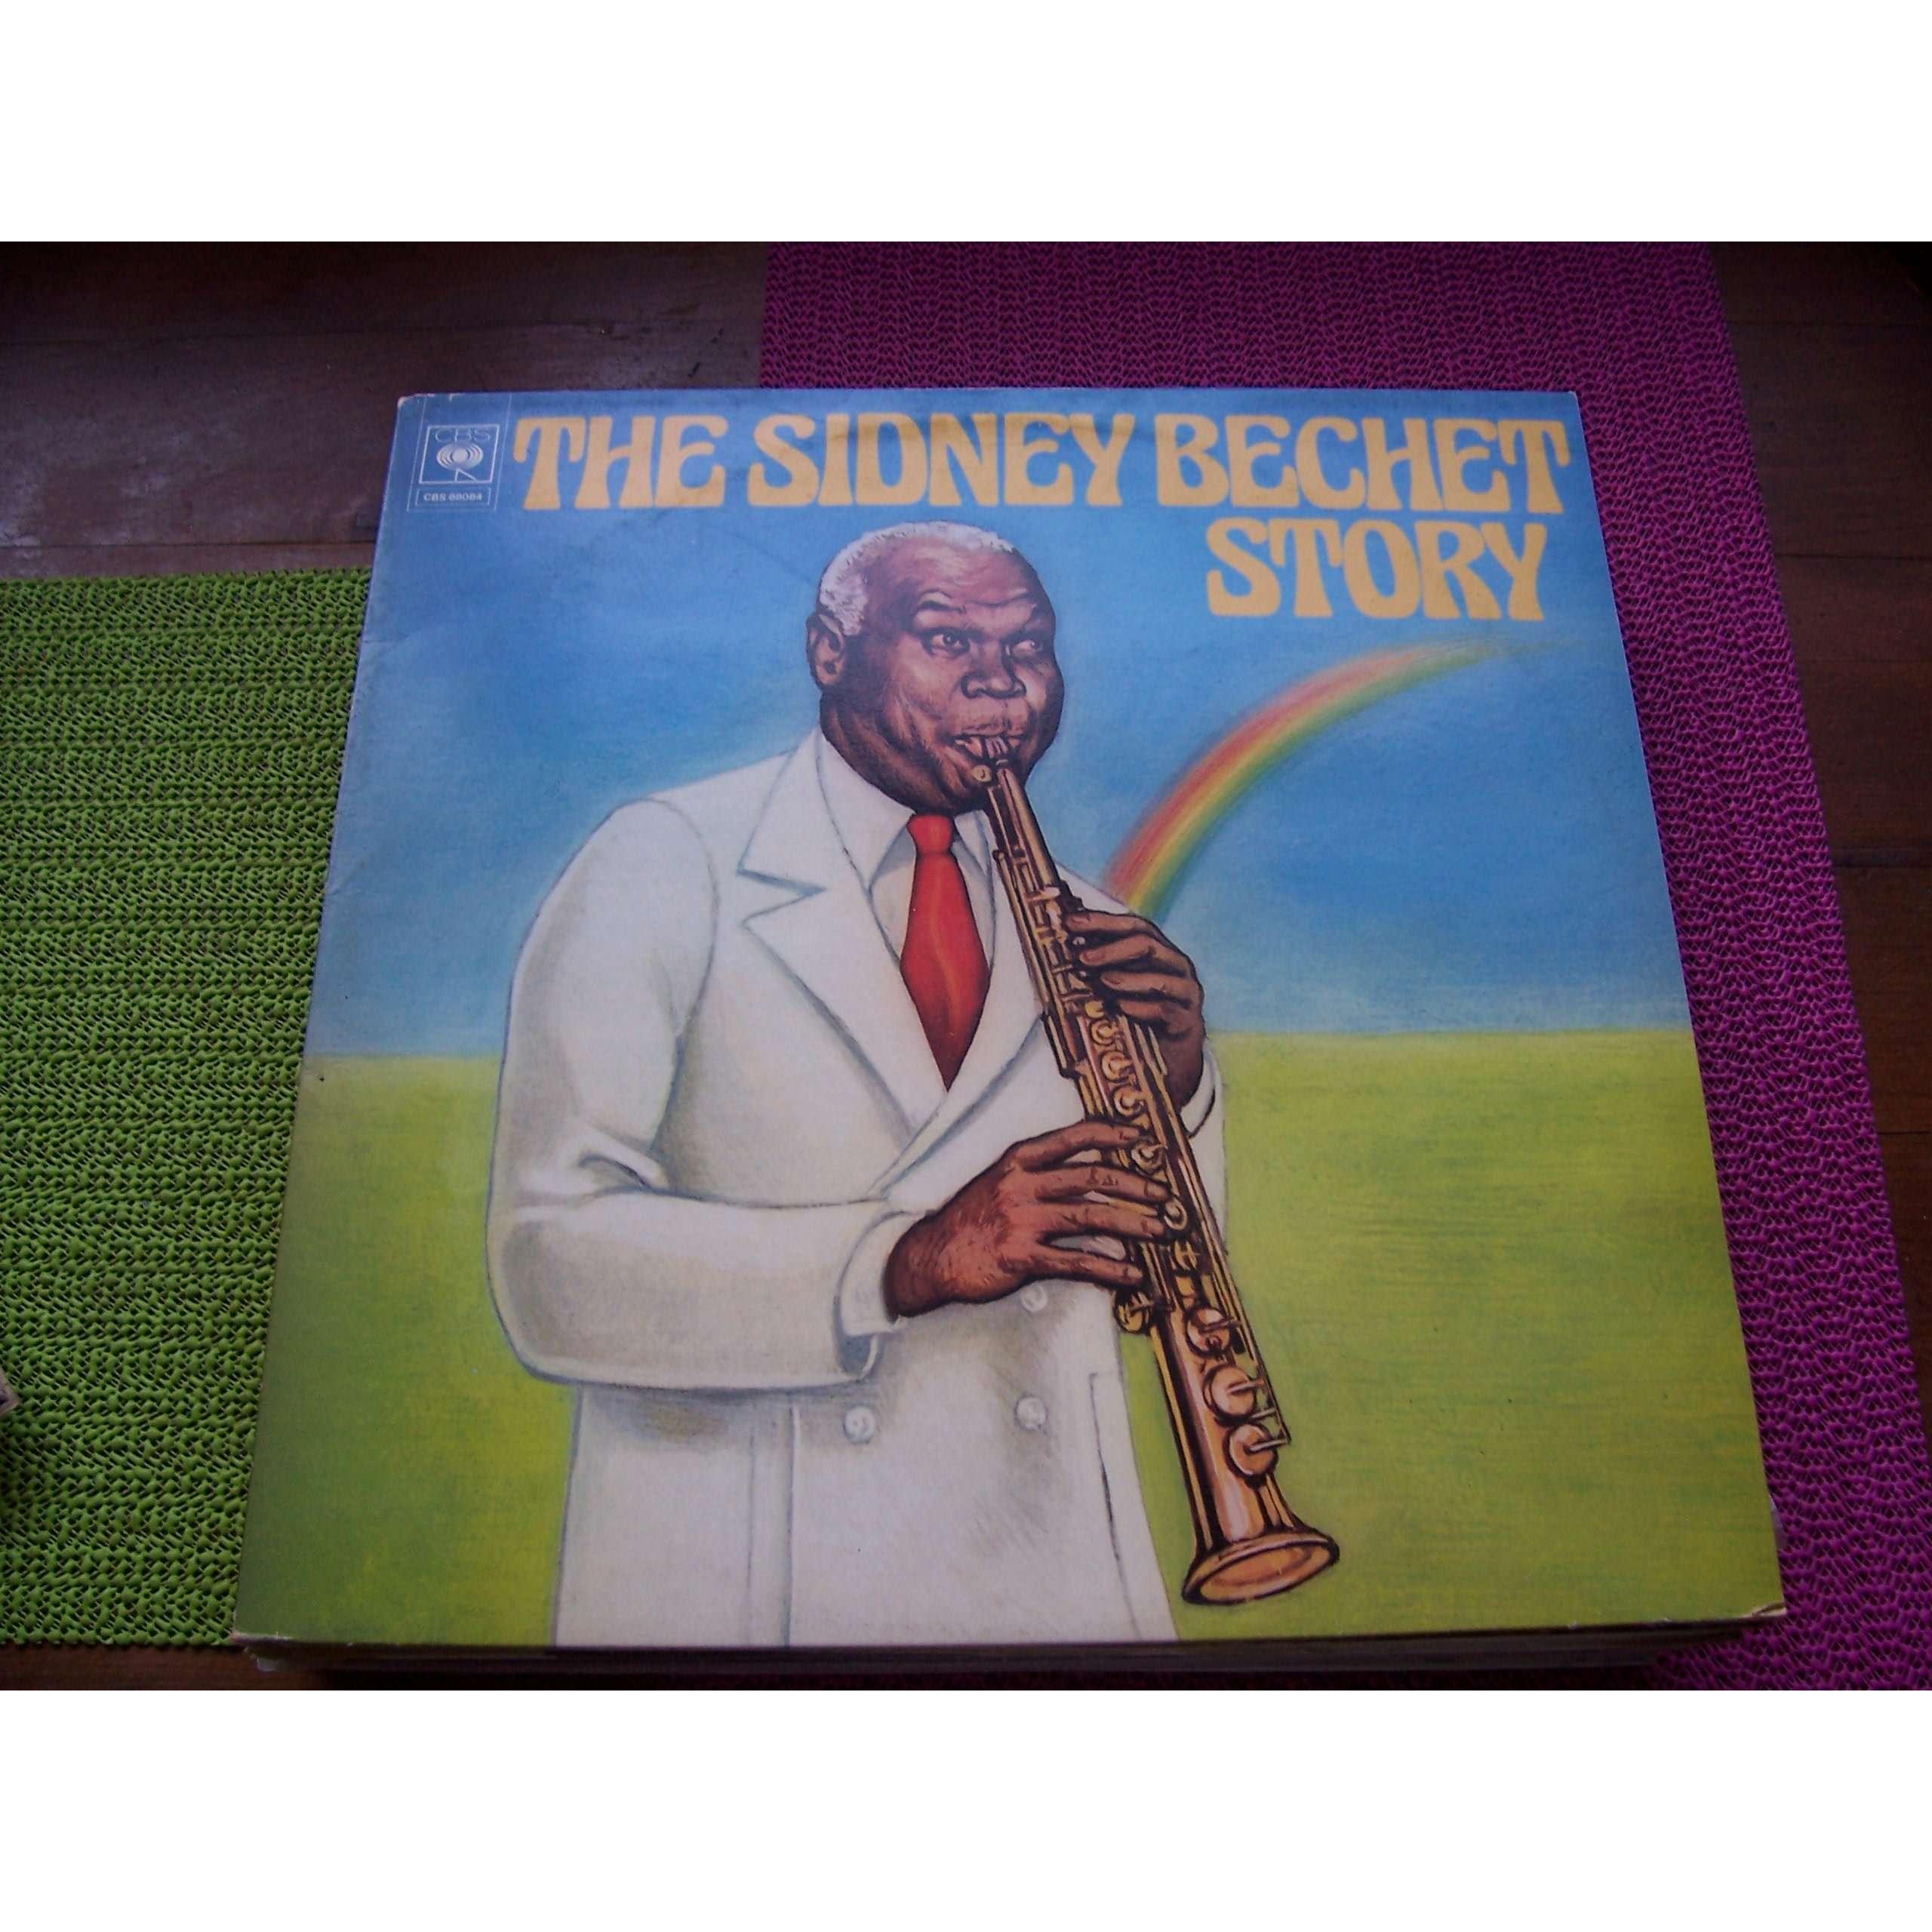 sidney bechet THE SIDNEY BECHET STORY